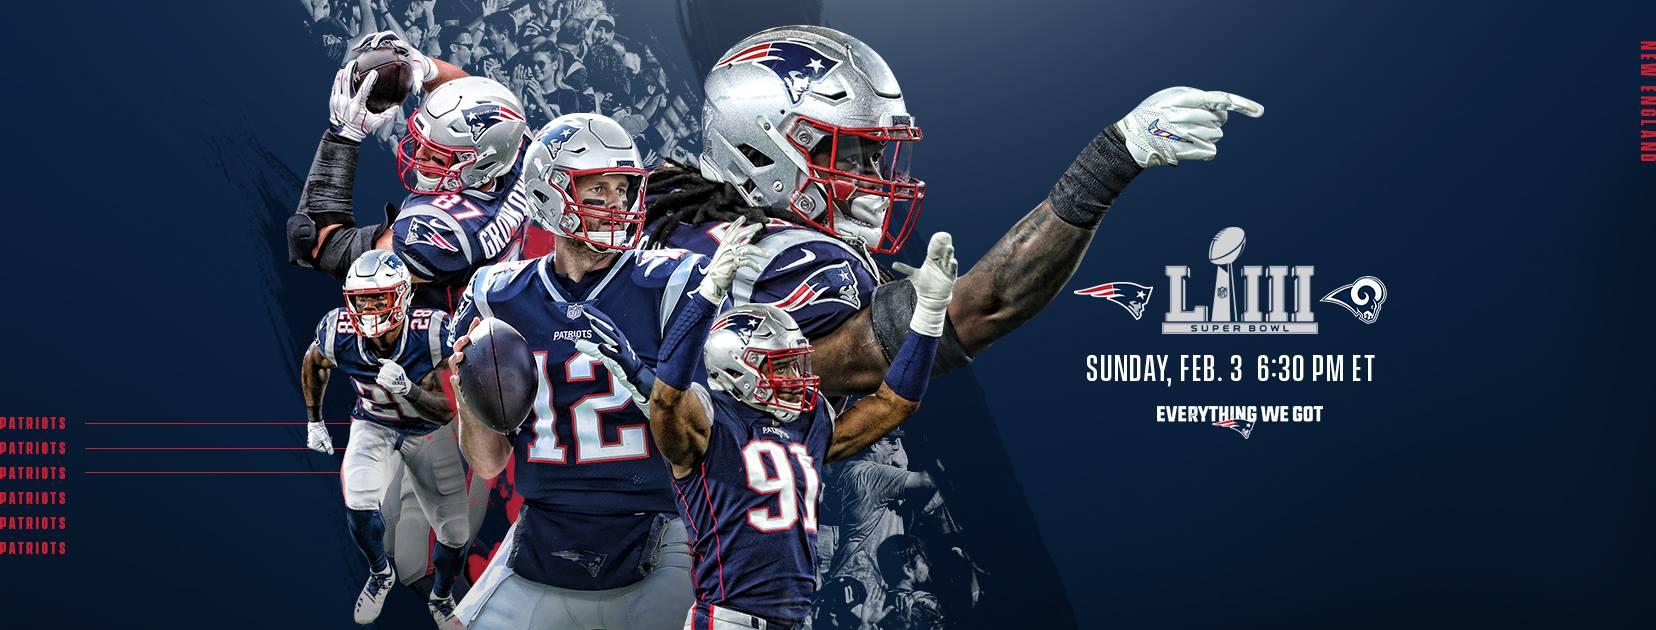 b2045412 Super Bowl LIII: New England Patriots vs. Los Angeles Rams [02/03/19]